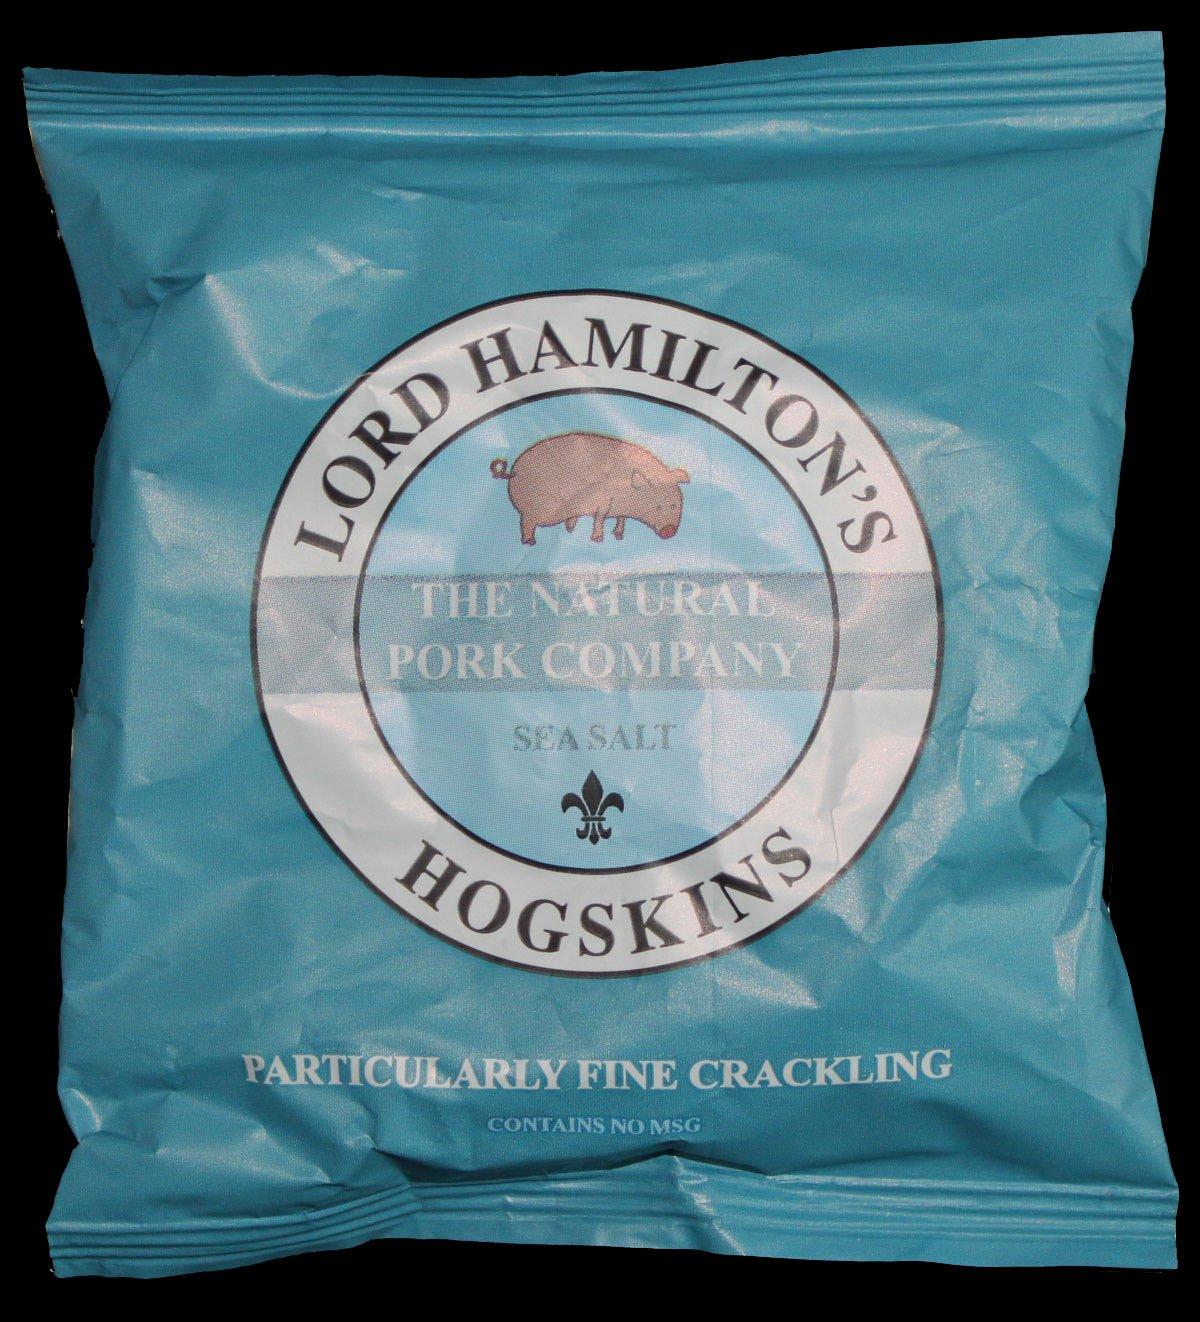 Lord Hamiltons Hogskins Sea Salt Particularly Fine Crackling Review - Lord Hamiltons Hogskins, Sea Salt, Particularly Fine Crackling Review